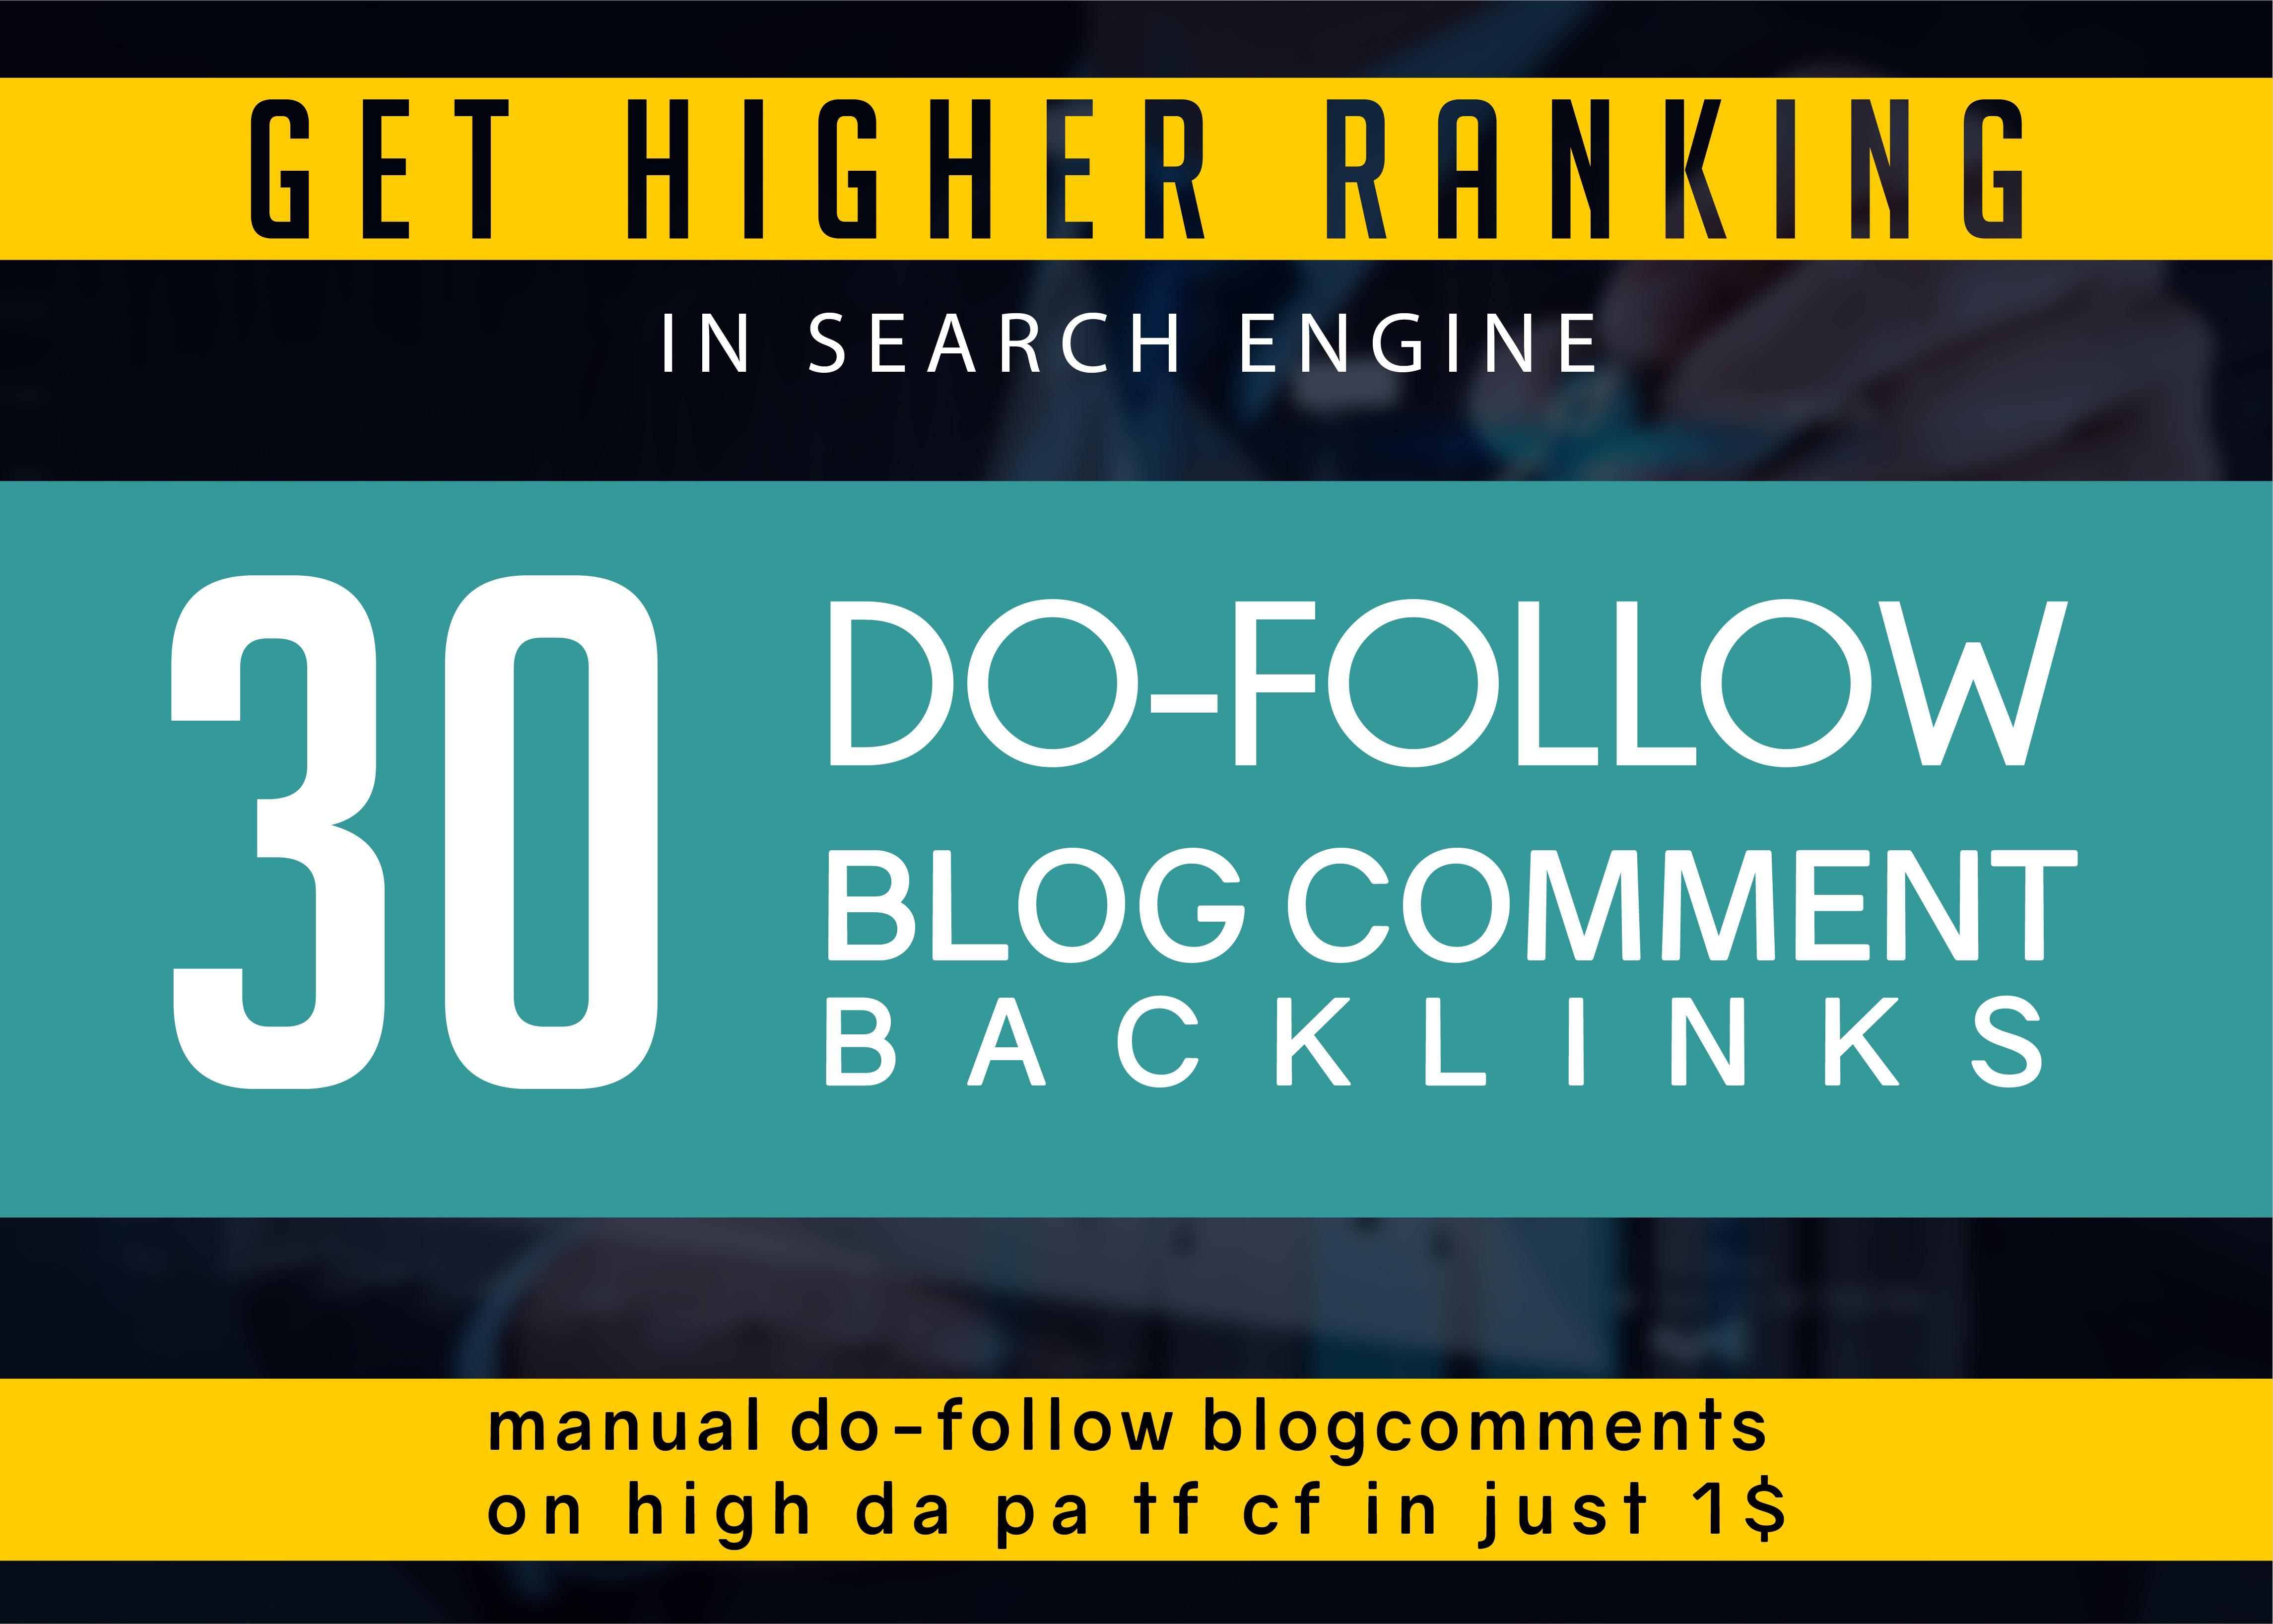 i make 30 Unique domain Dofollow Blogcomment Backlinks